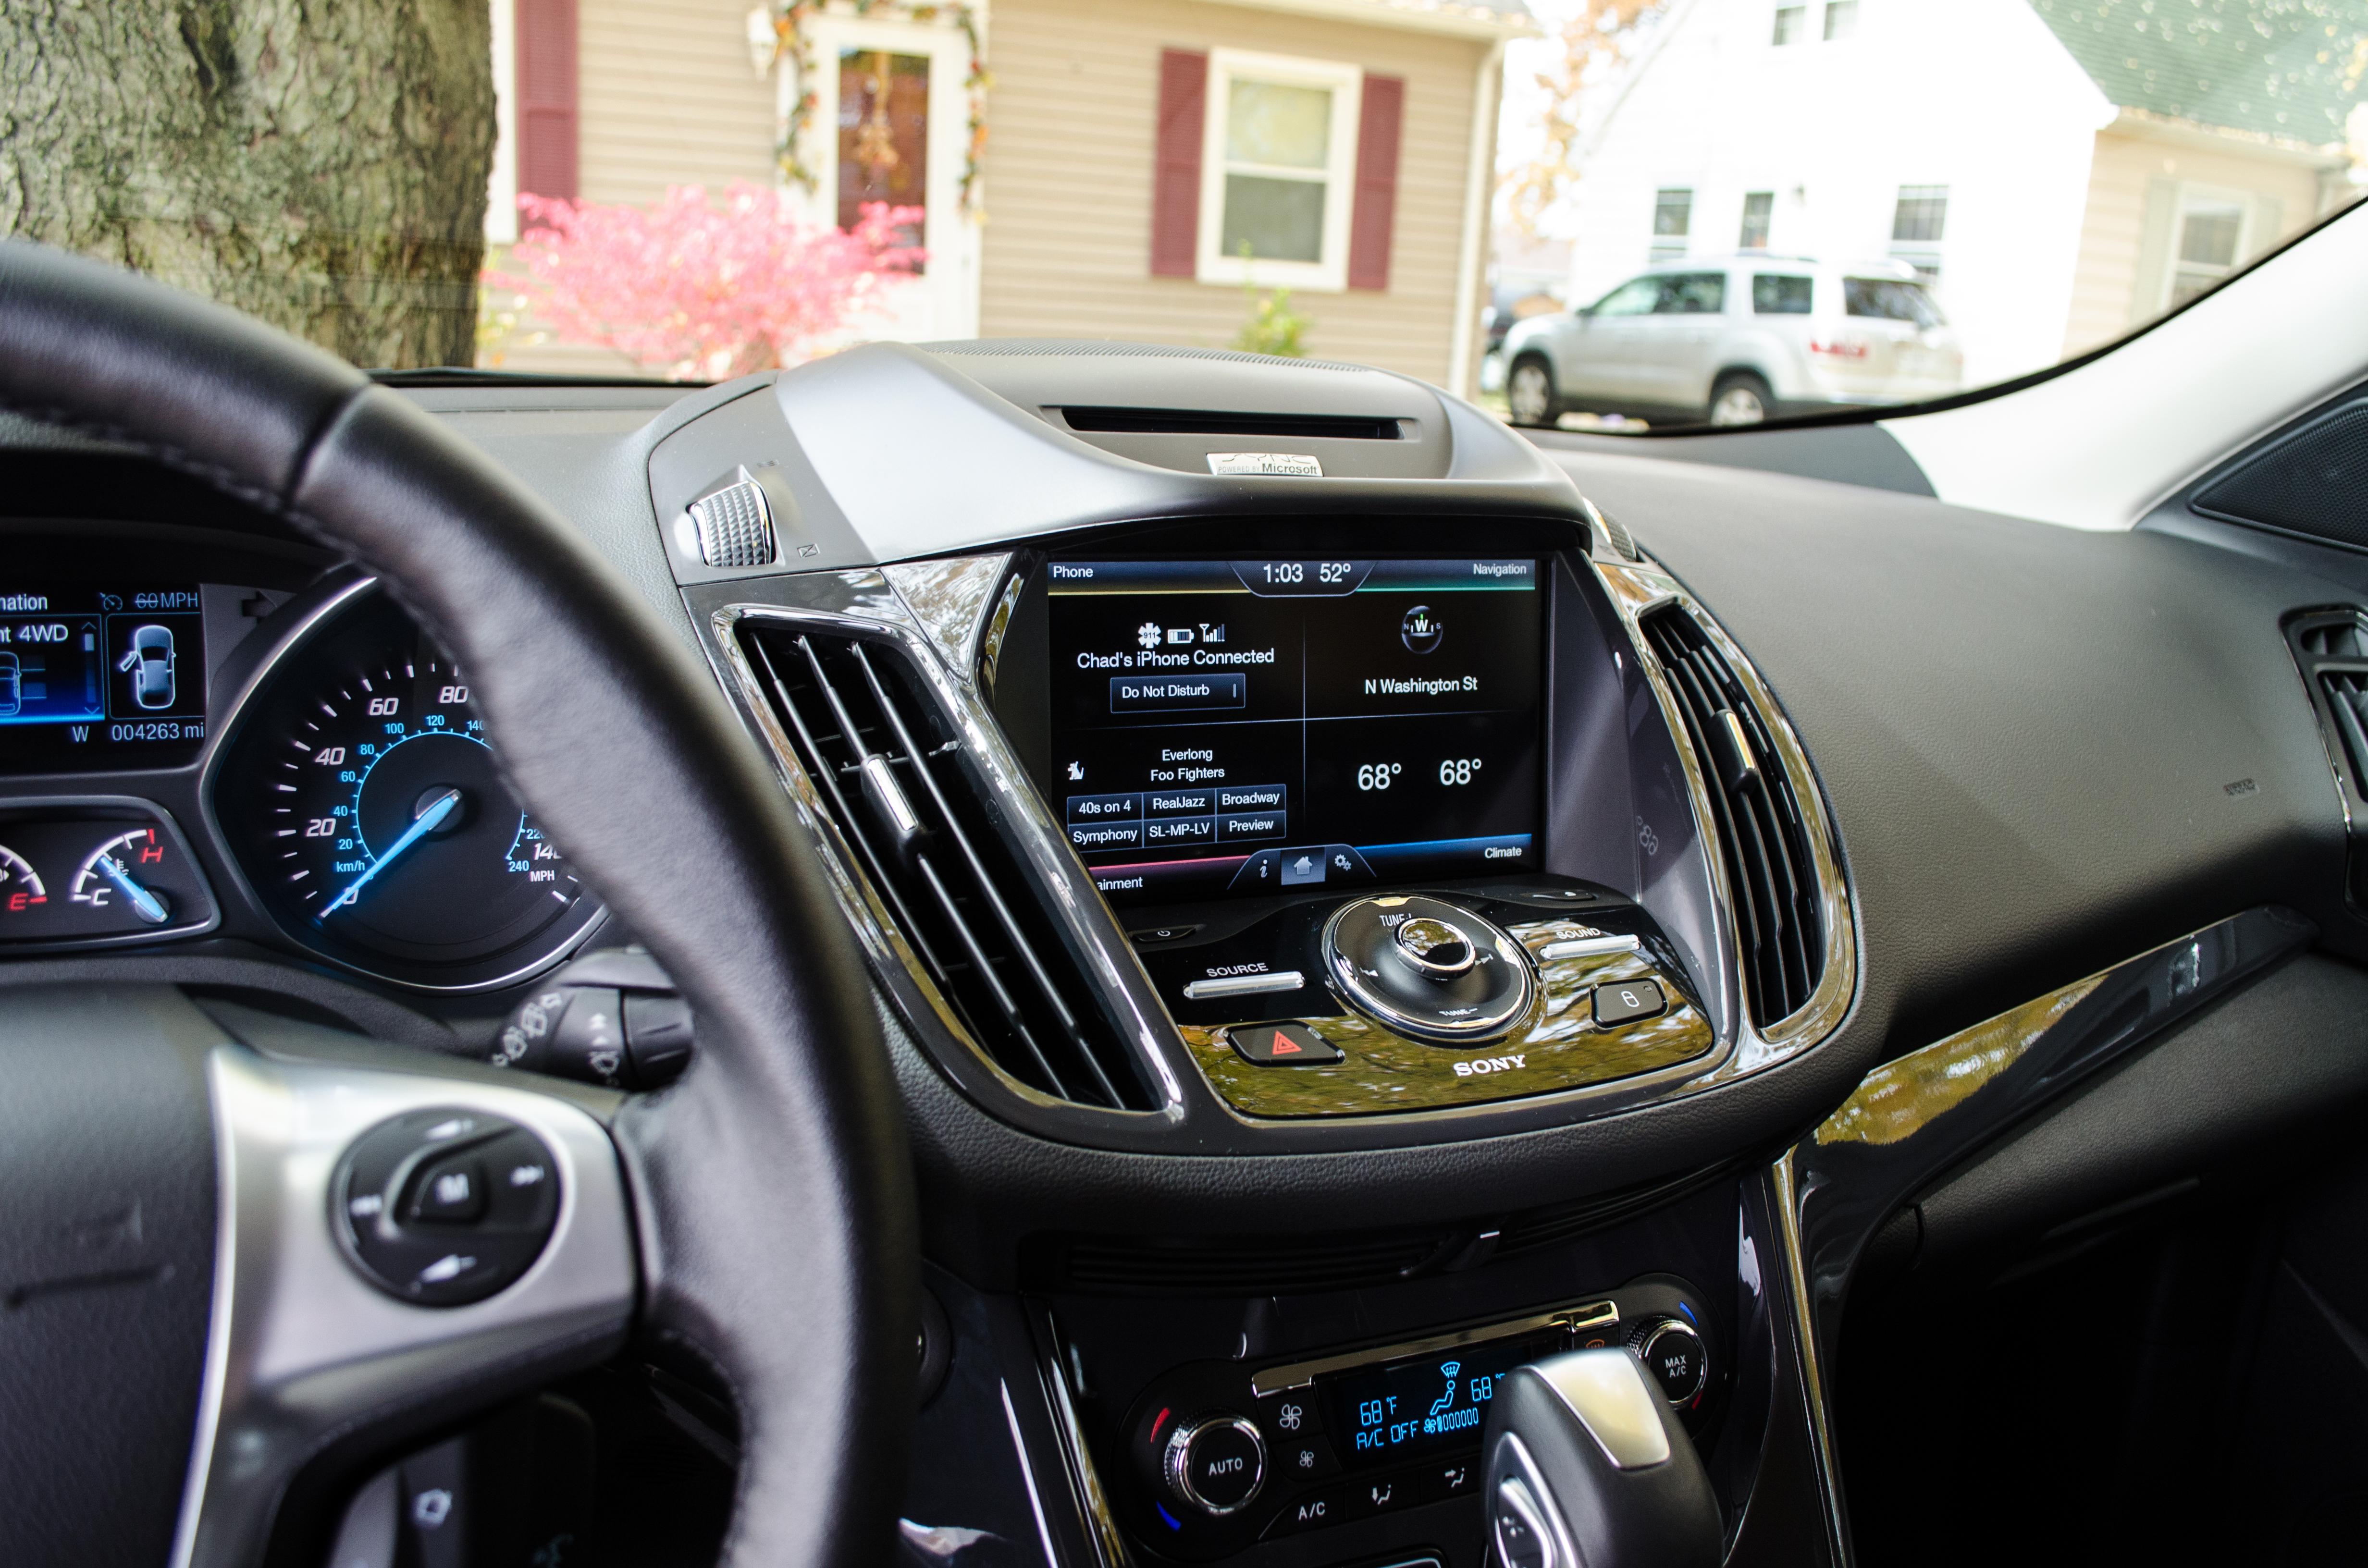 2014 Ford Escape Titanium 27 of 34  Motor Review